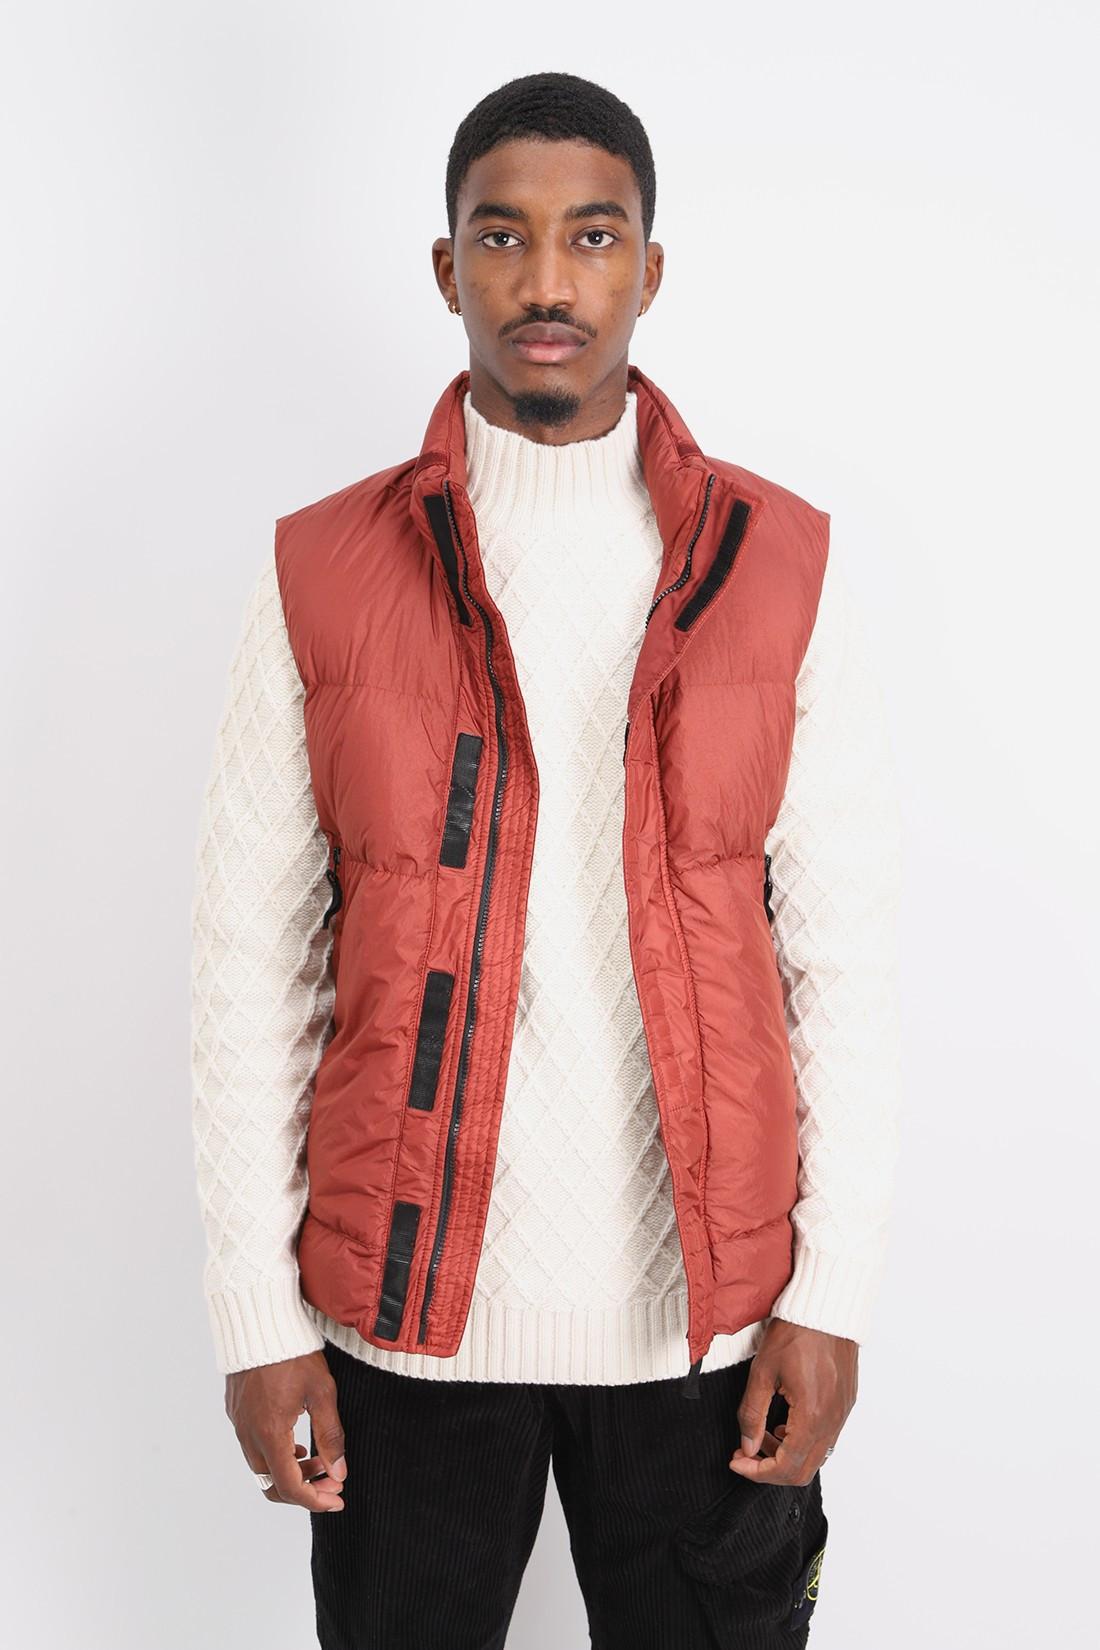 STONE ISLAND / G0123 sleeveless down jacket V0015 mattone